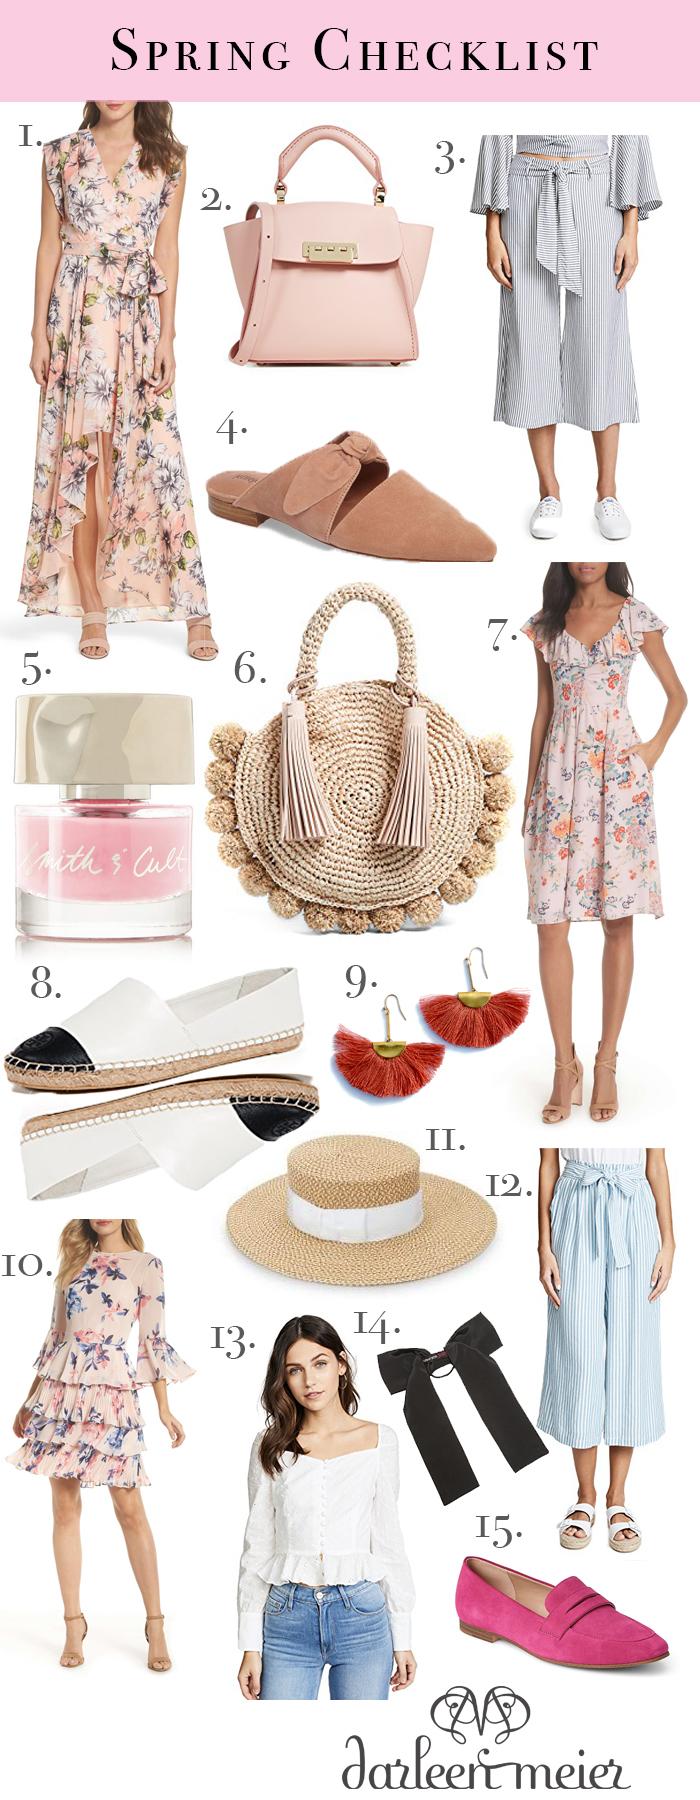 Spring Checklist Style Trends || Darling Darleen